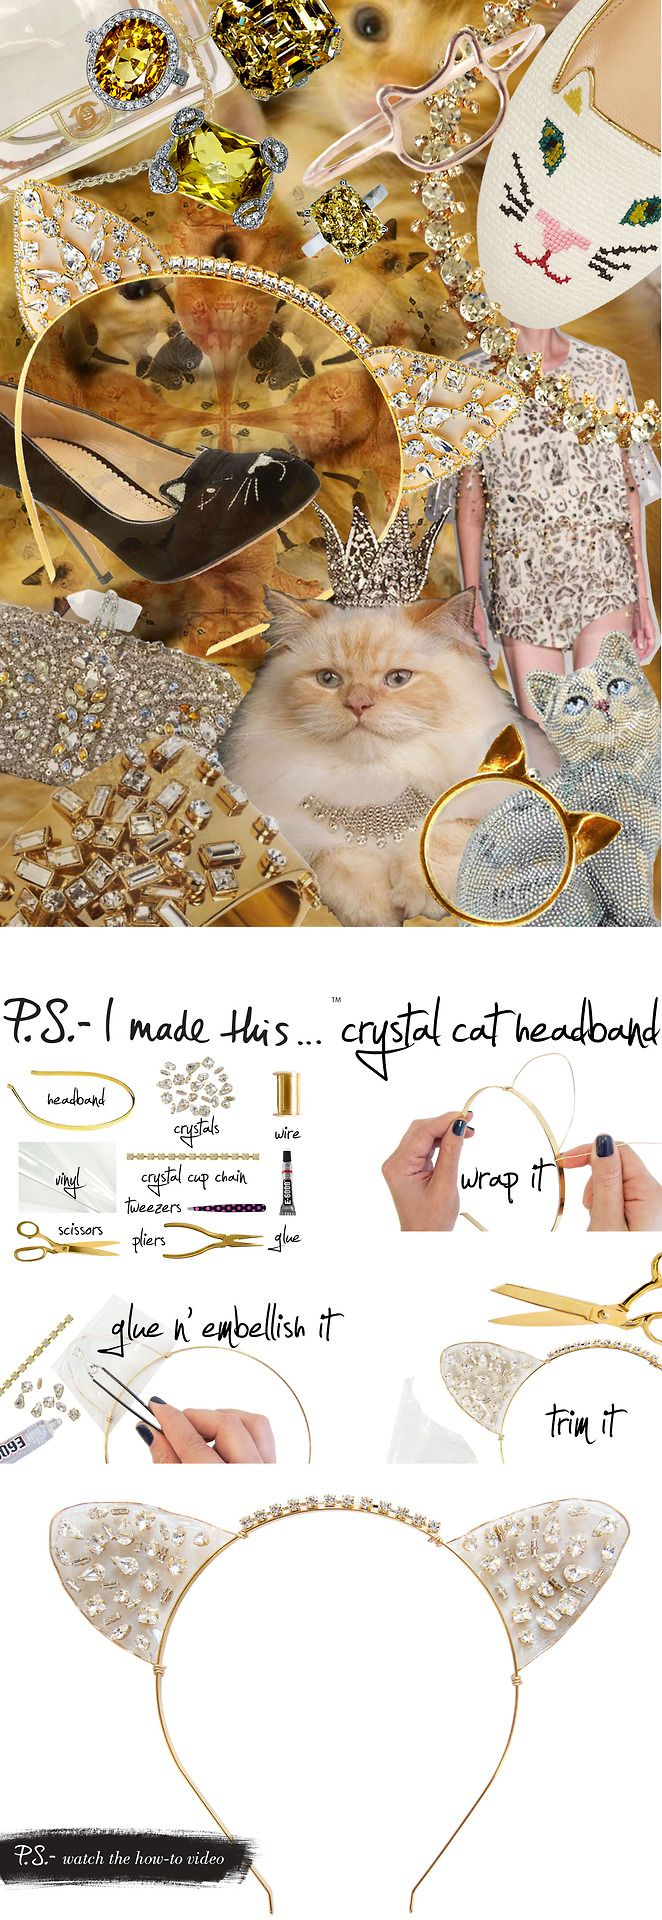 P.S.-I made this...Crystal Cat Headband #PSIMADETHIS #DIY @Farshad Family Inanlou Step #FelineArts